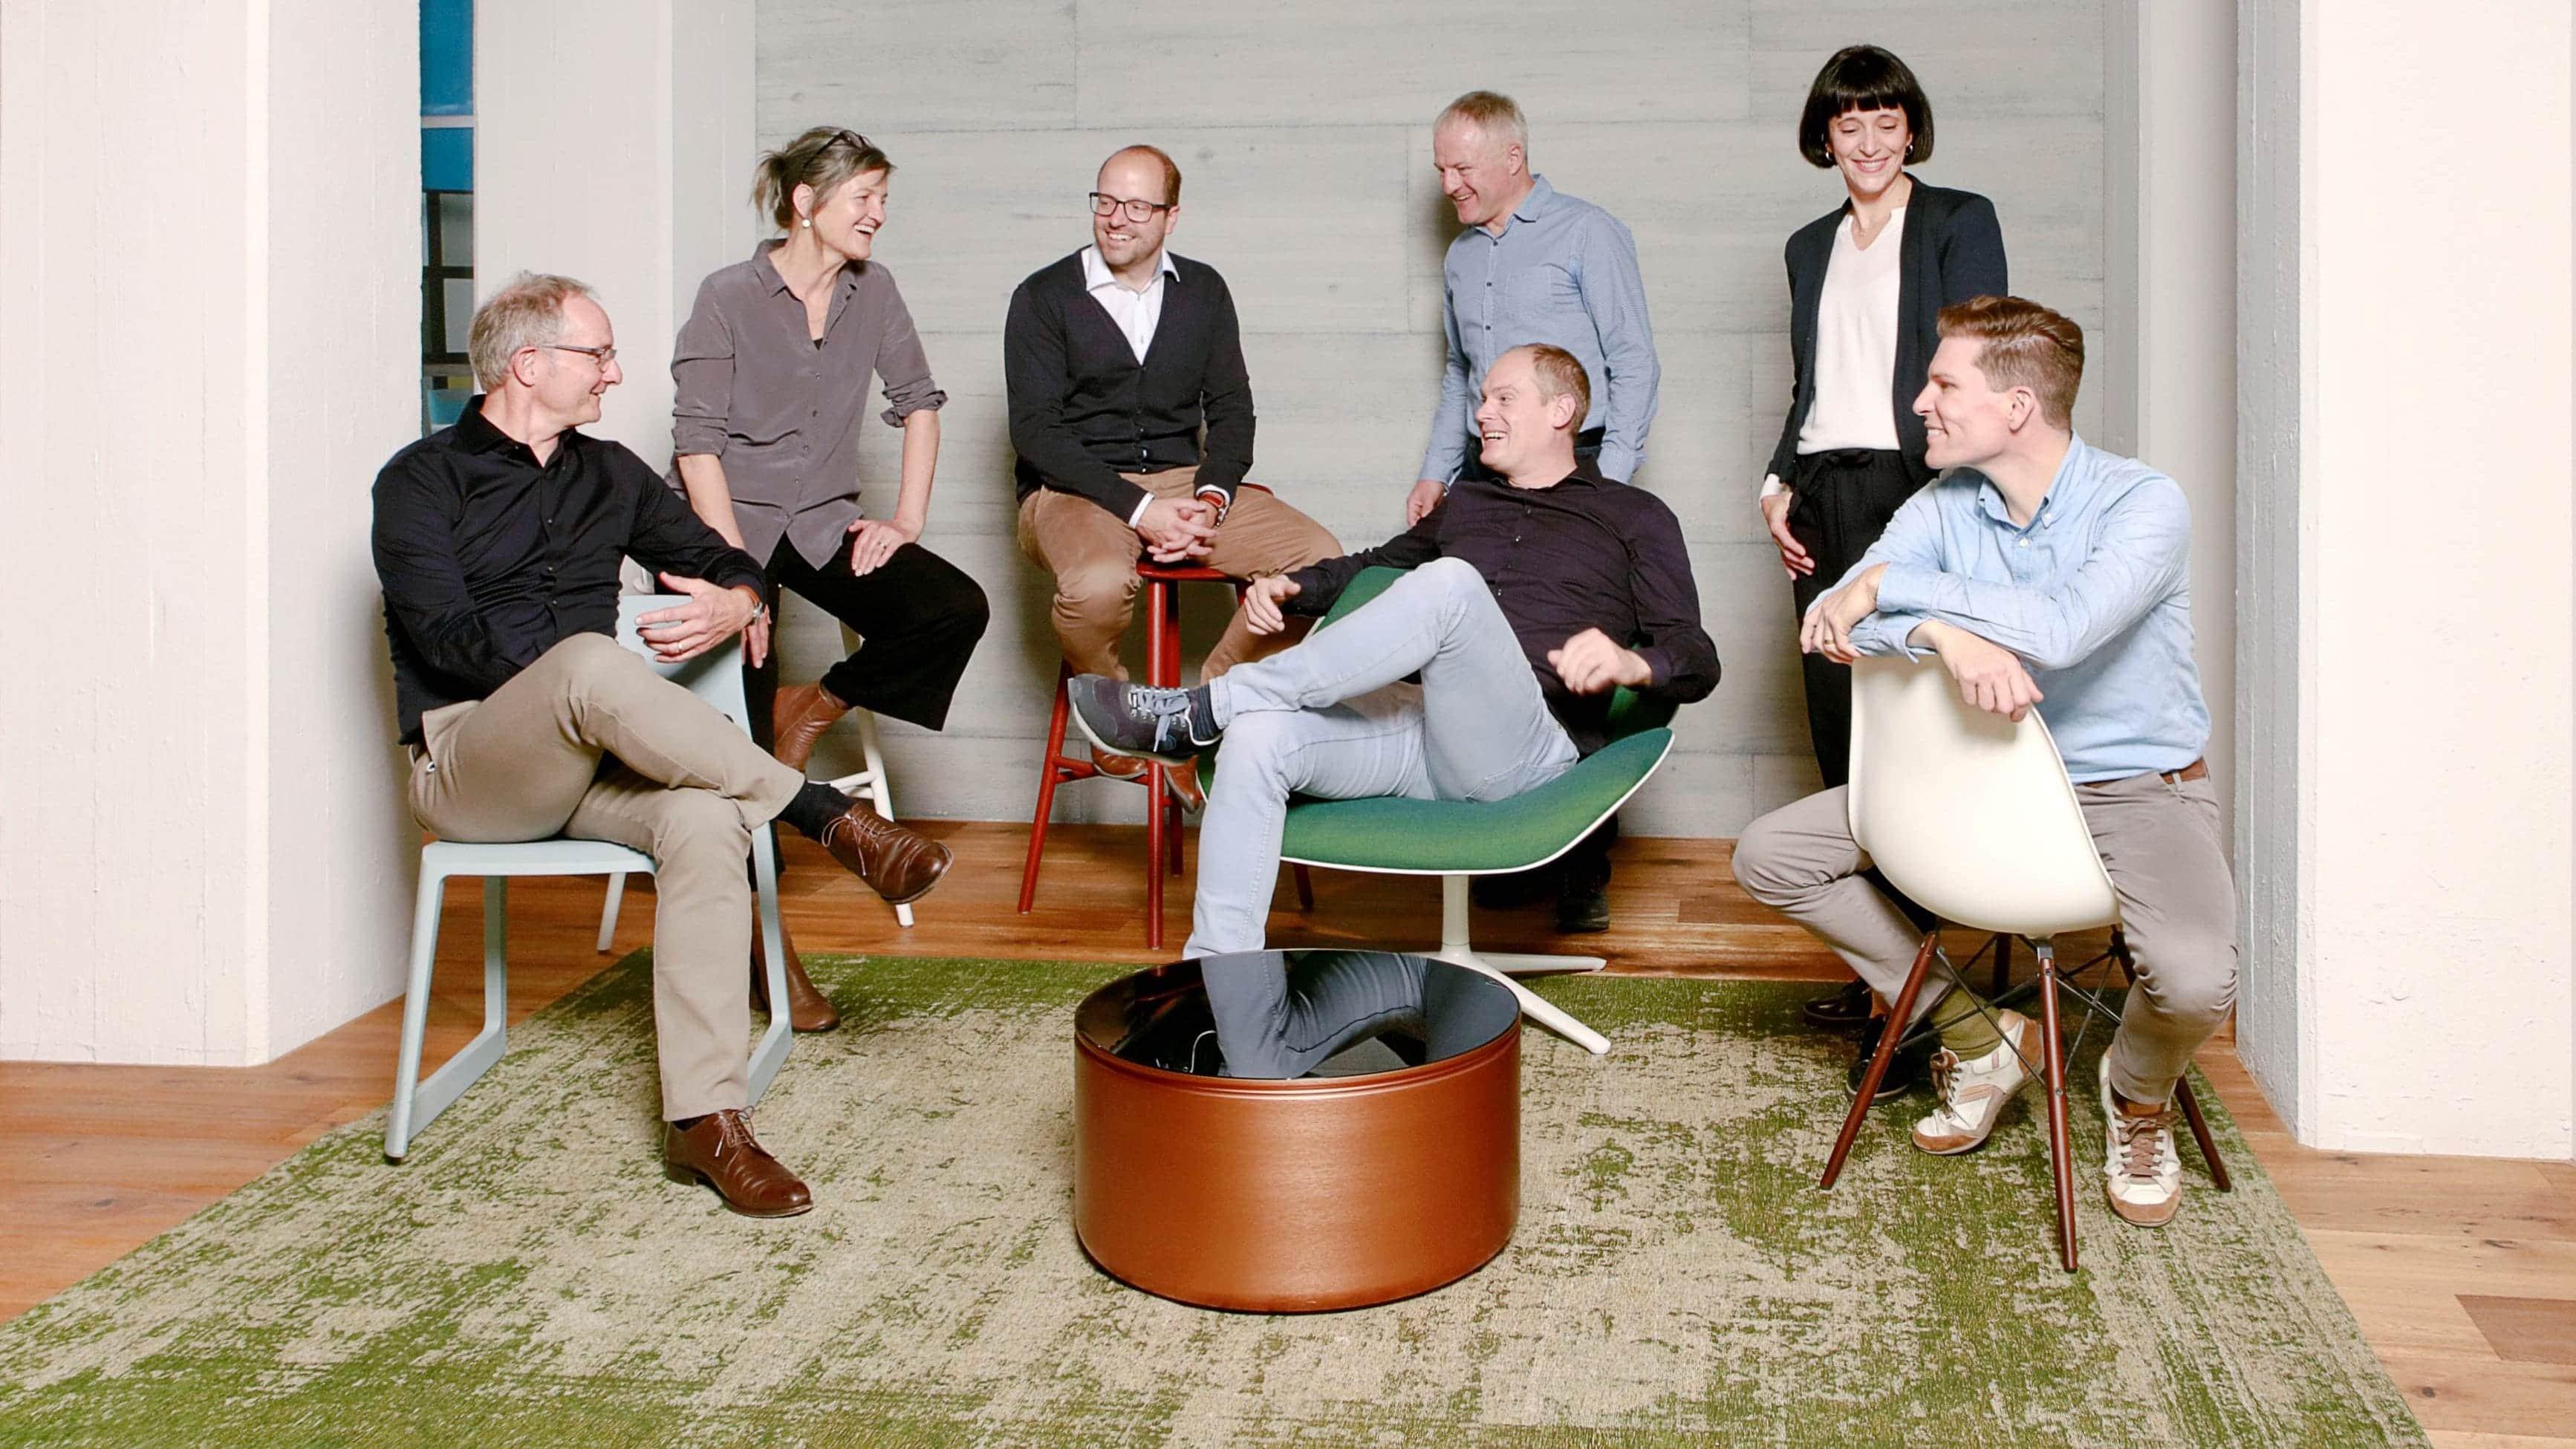 Odermatt Ideenschreinerei Team Gruppenbild Geschäftsführung